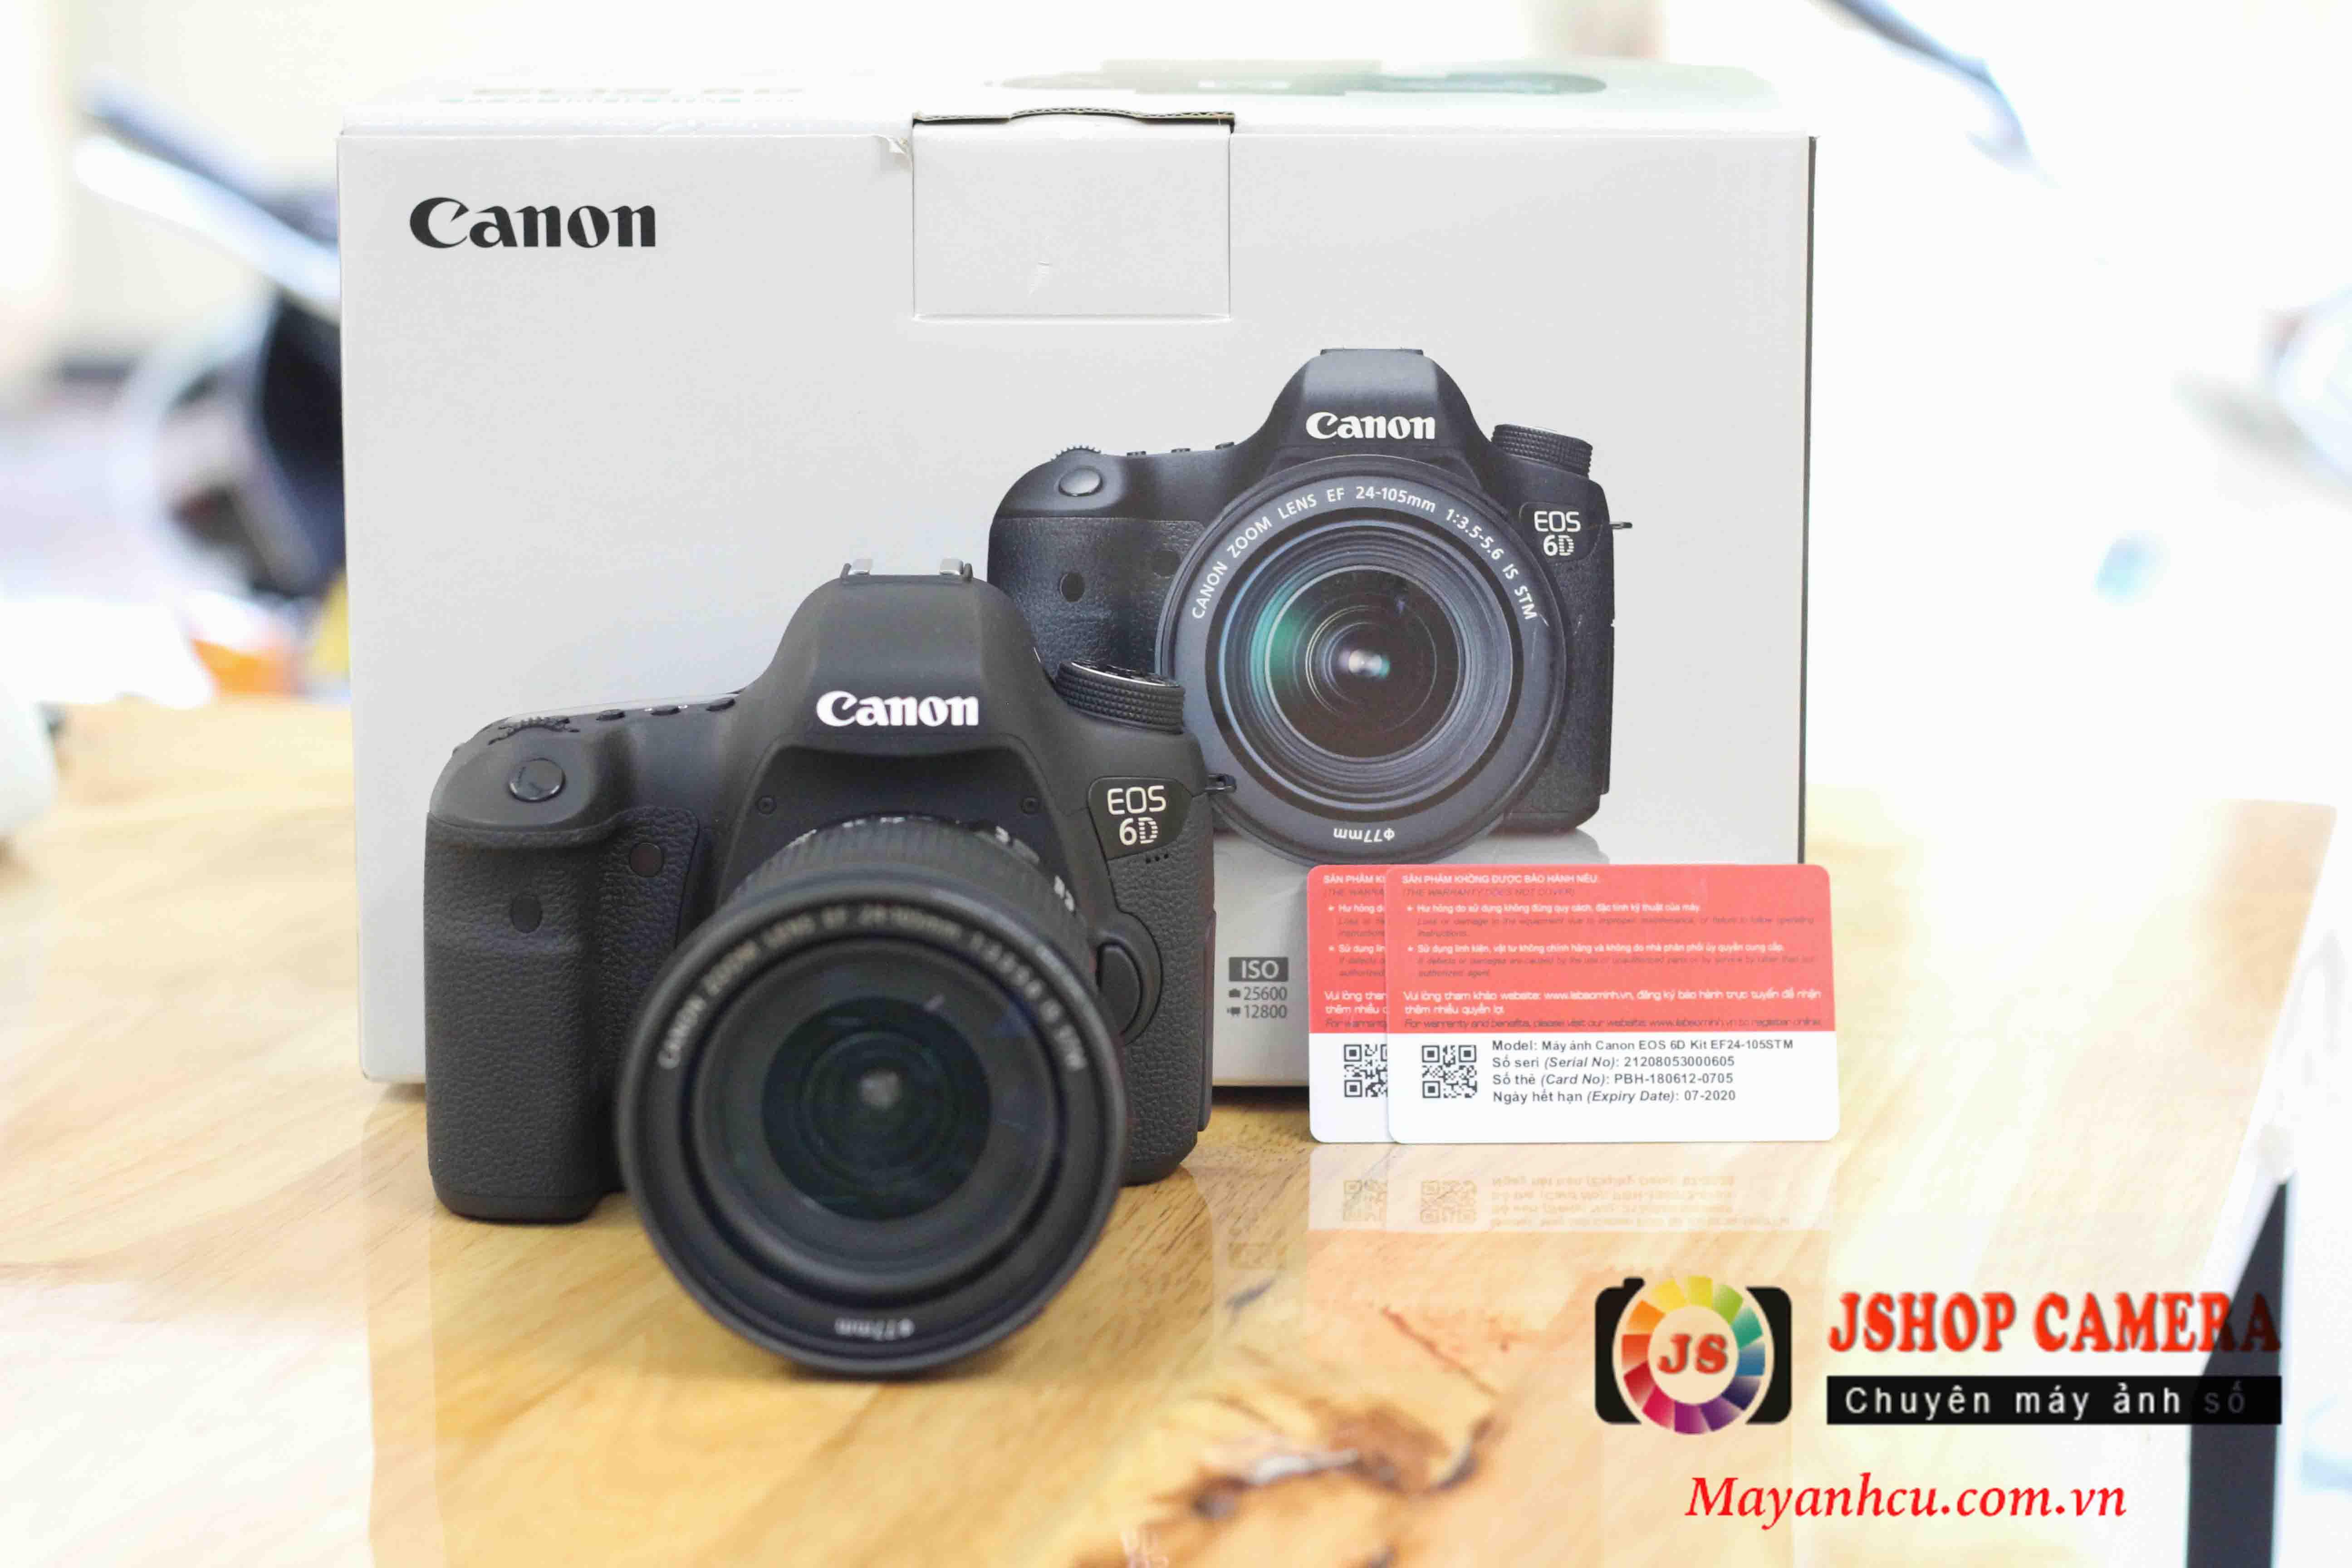 Máy ảnh Canon 6D + Lens 24-105mm F/3.5-5.6 IS STM